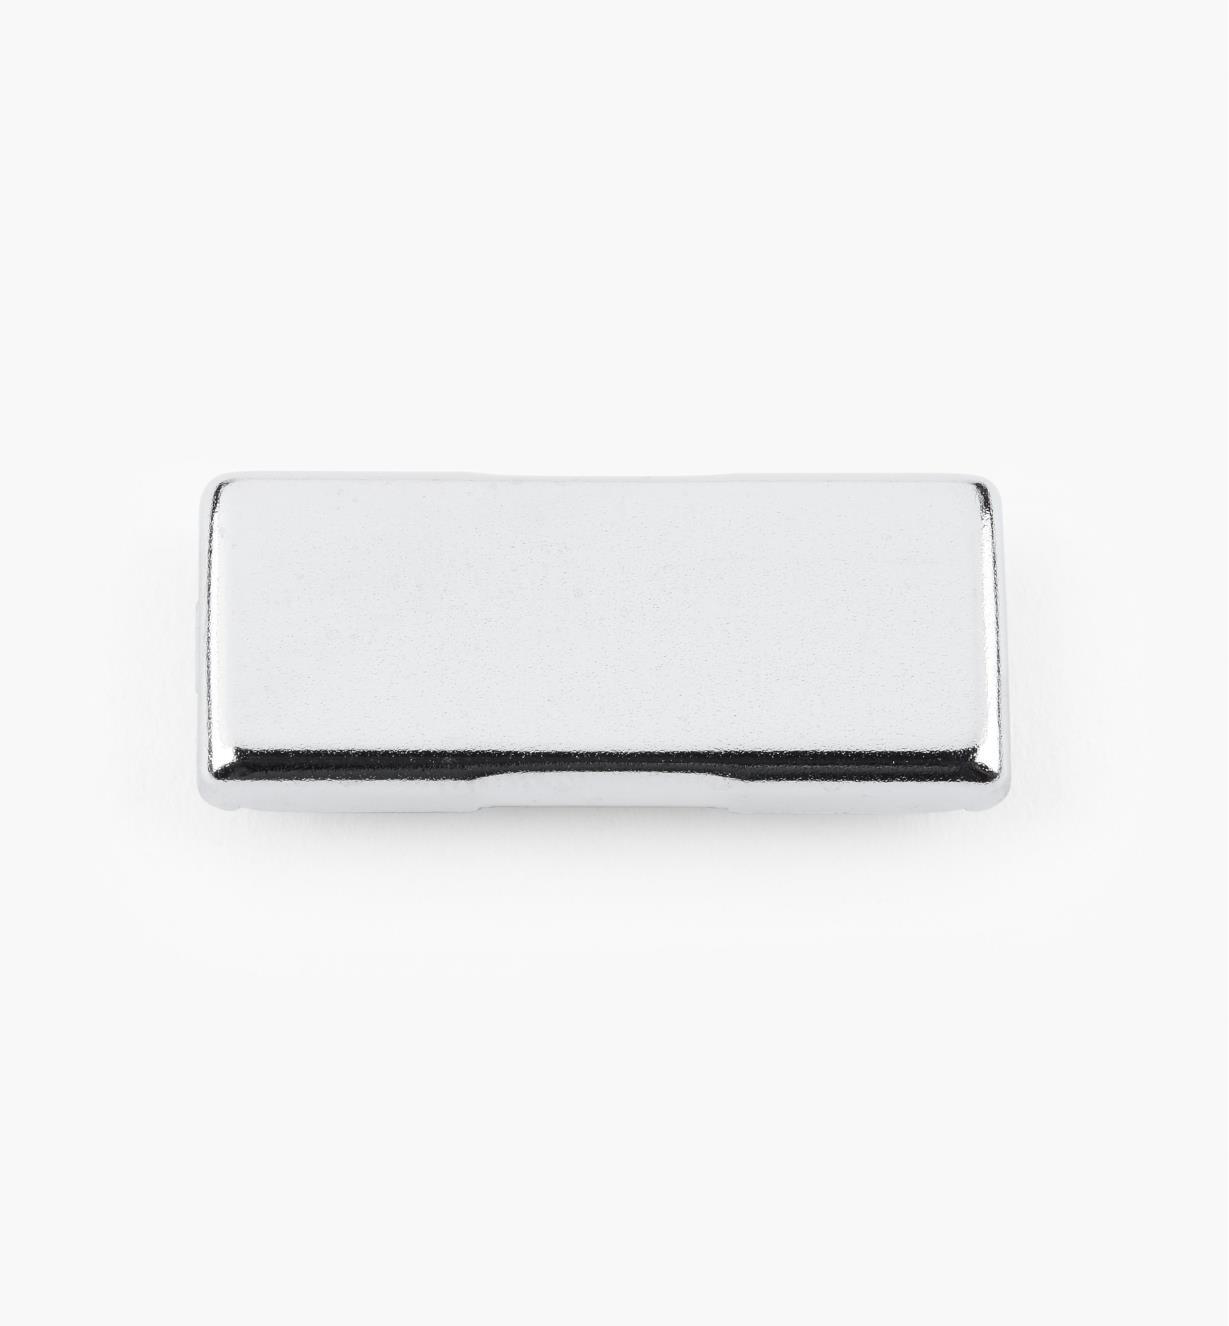 00B1551 - Arm Cap, Style E